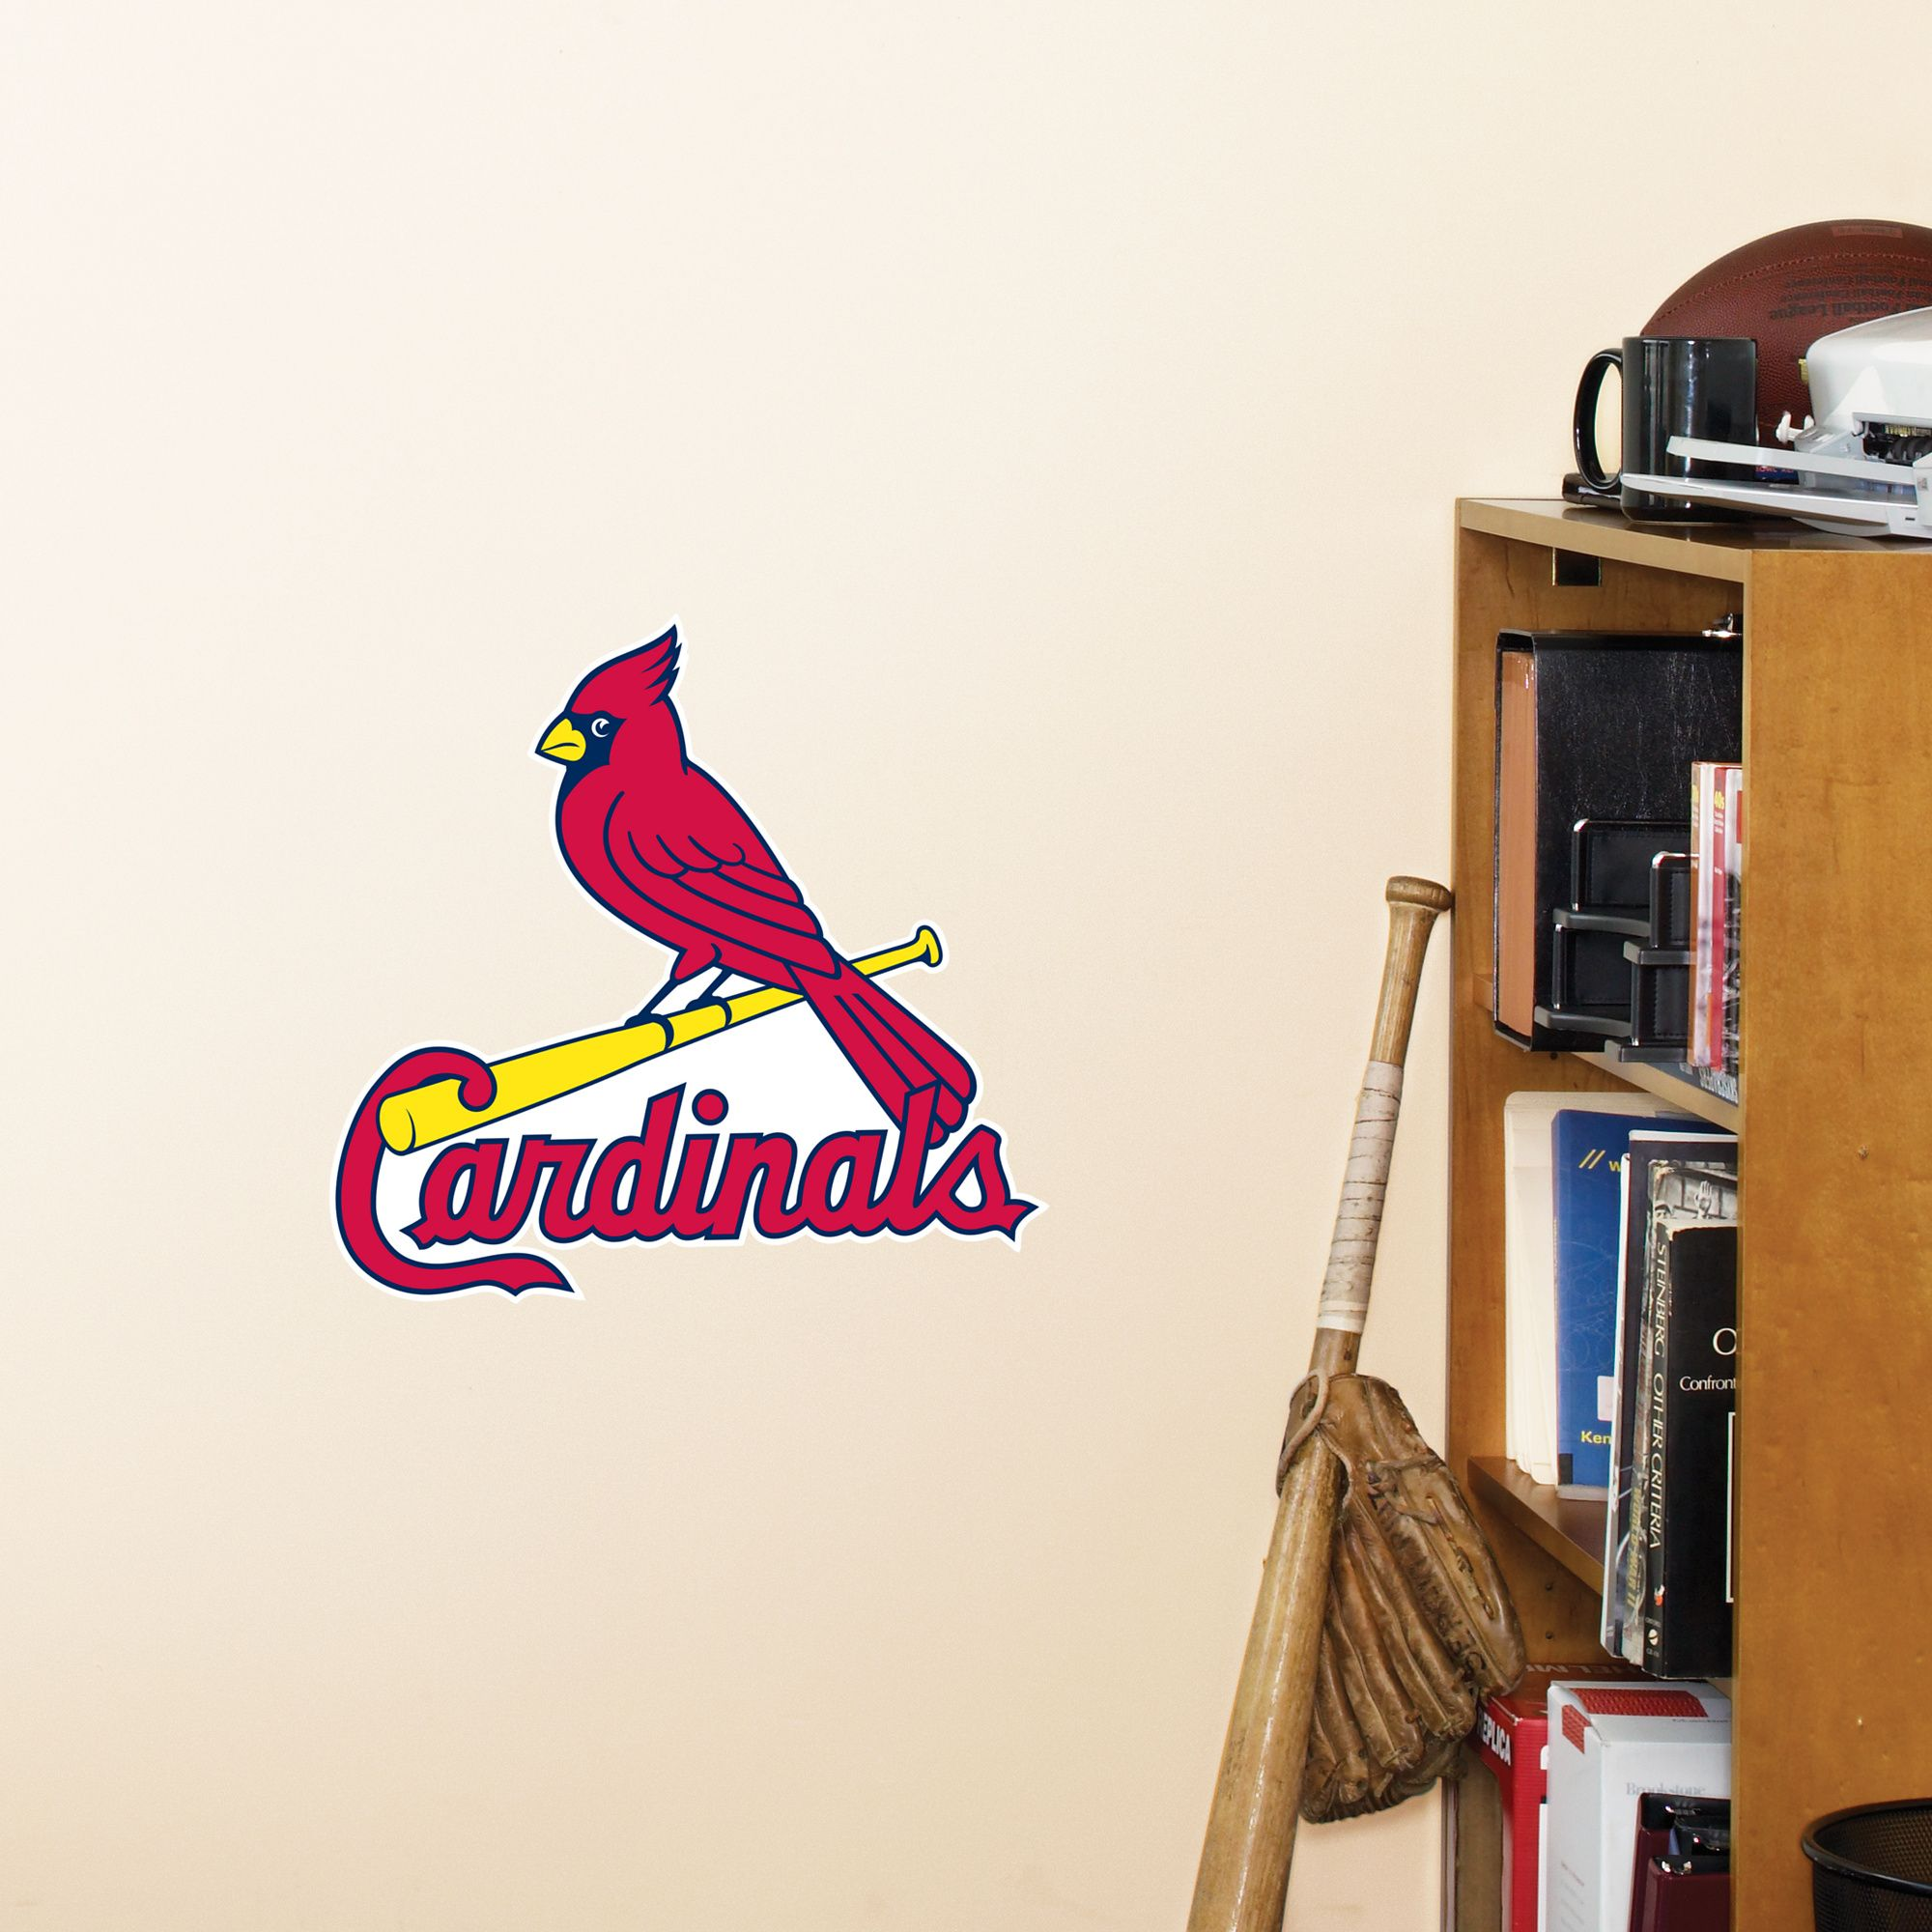 St Louis Cardinals Teammate Fathead Wall Graphic St Louis Cardinals Wall Decal Sports Decor Baseball